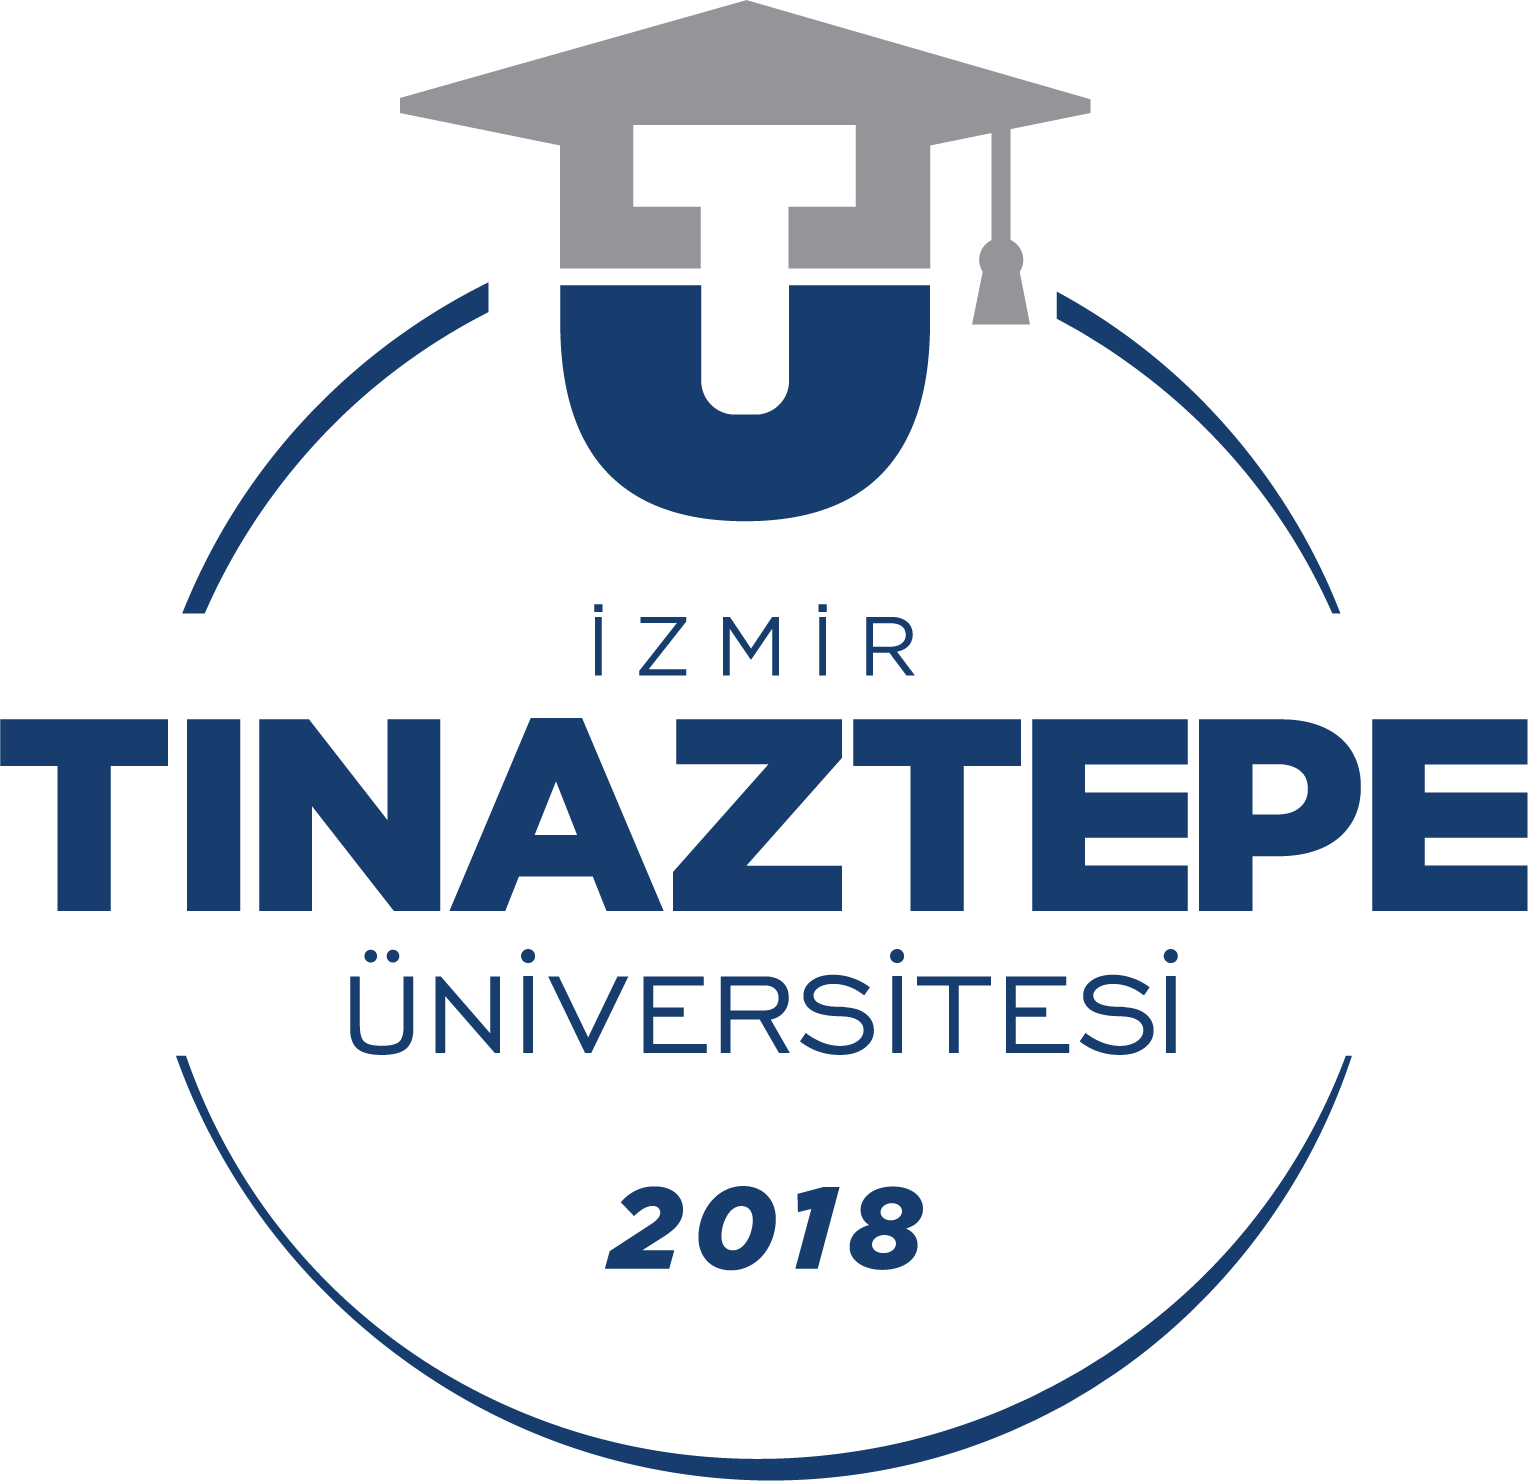 İzmir Tınaztepe Üniversitesi hjtghj